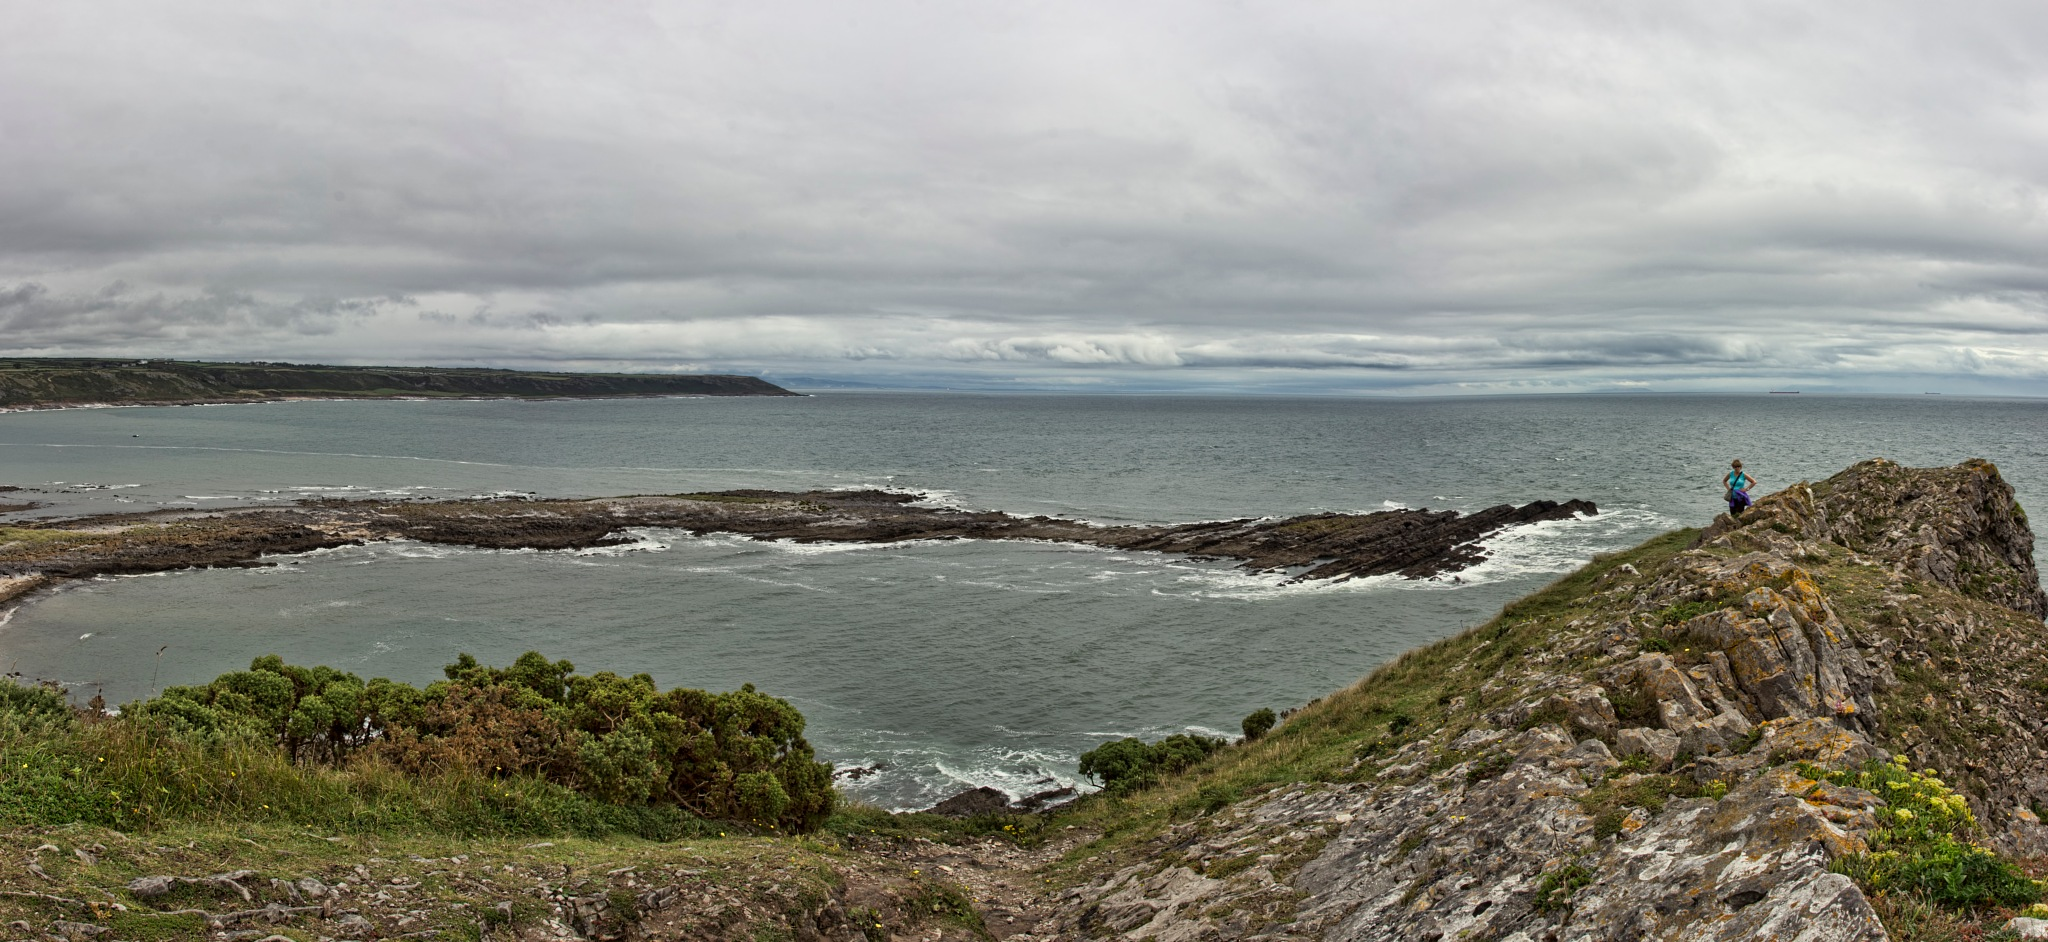 Port Eynon panorama by plw1053